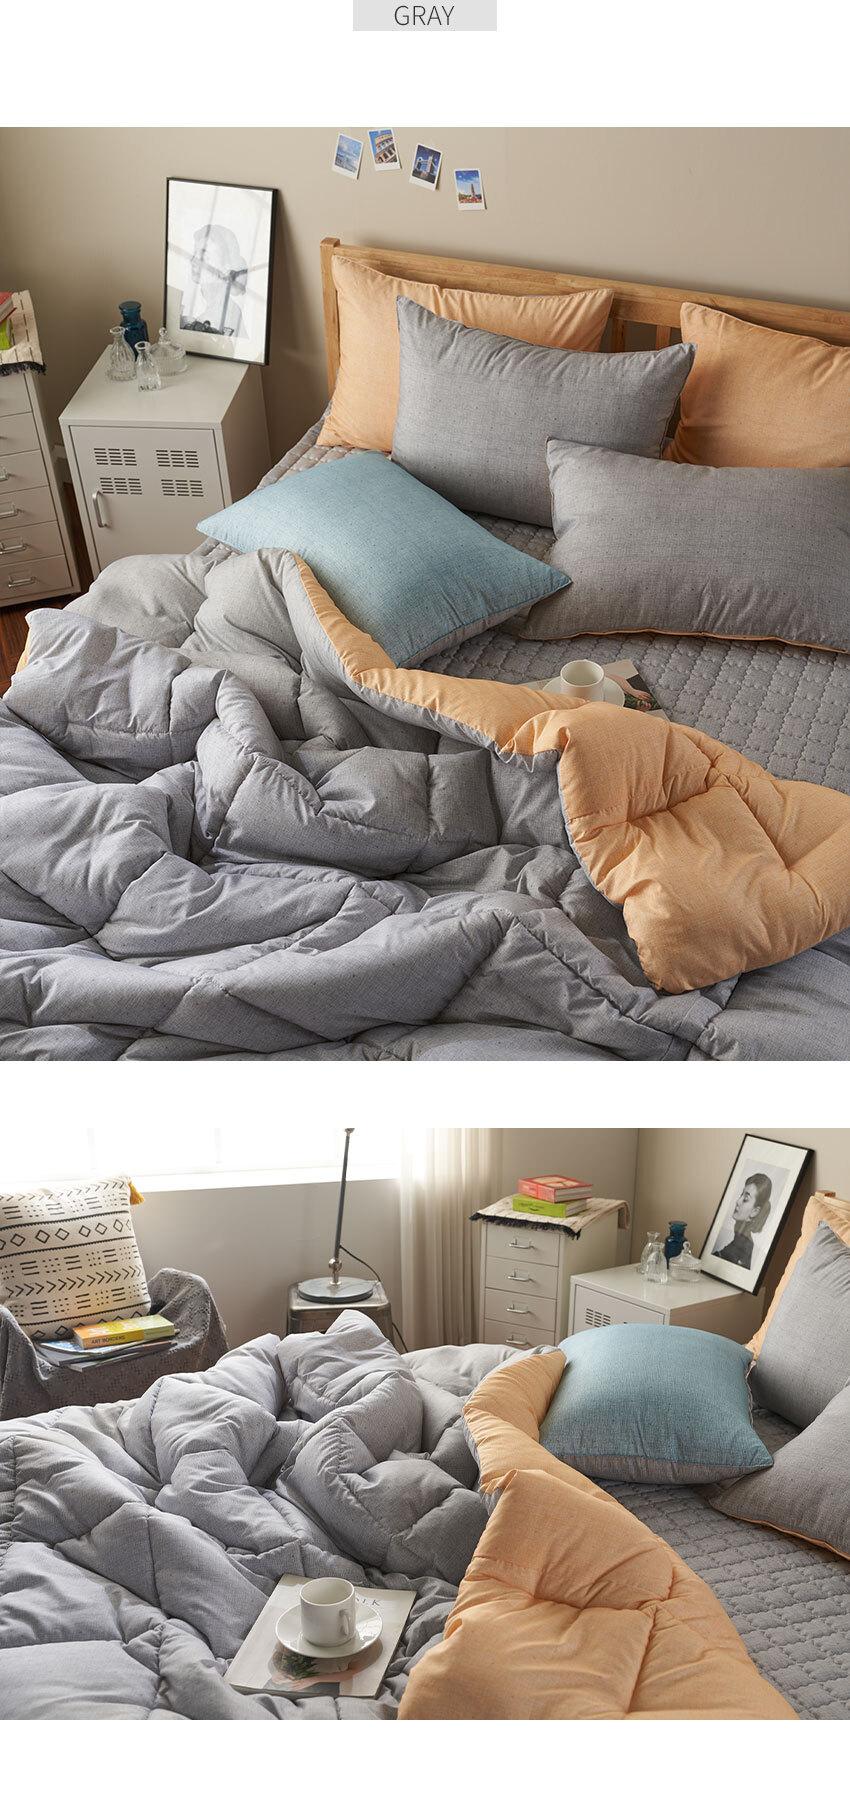 minicheck_bed_gray.jpg